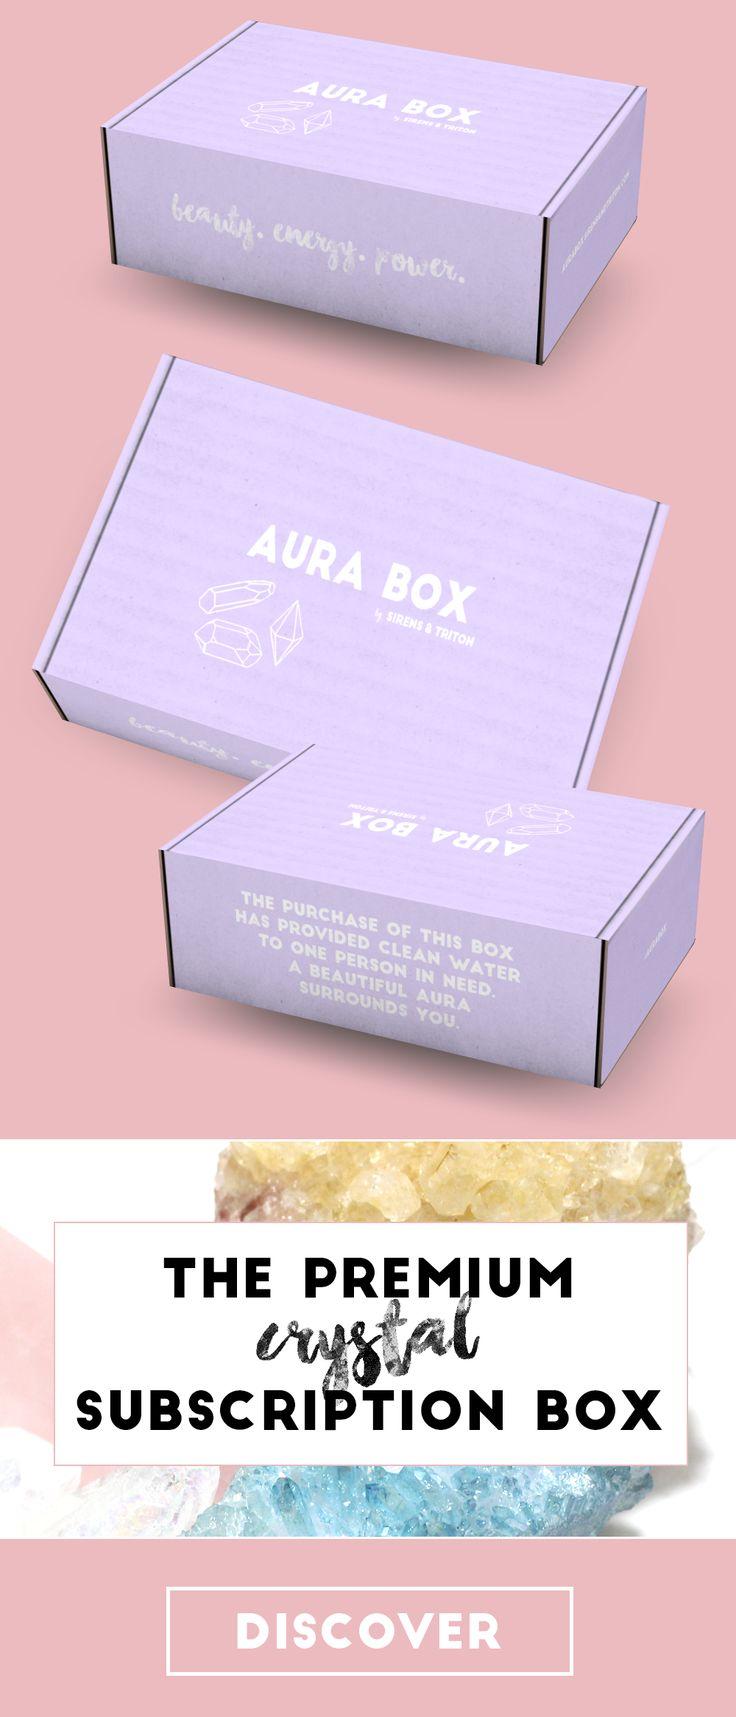 Best 25 Subscription boxes ideas on Pinterest Beauty box